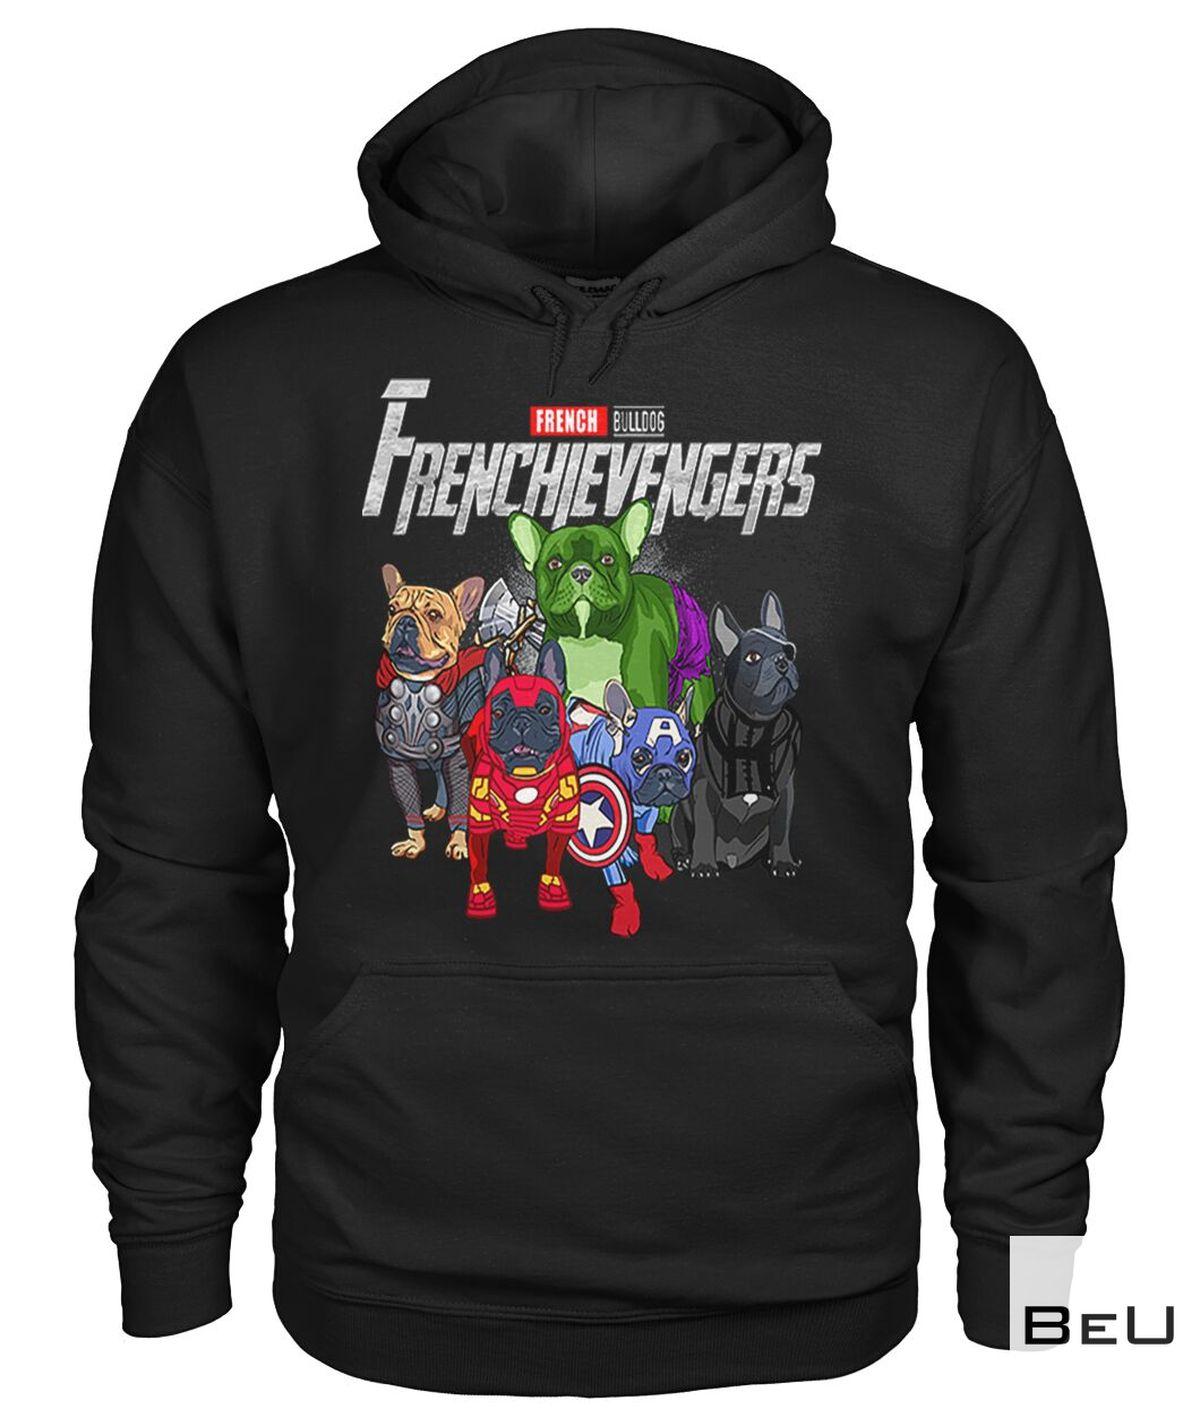 French Bulldog Frenchievengers Avengers Shirtz